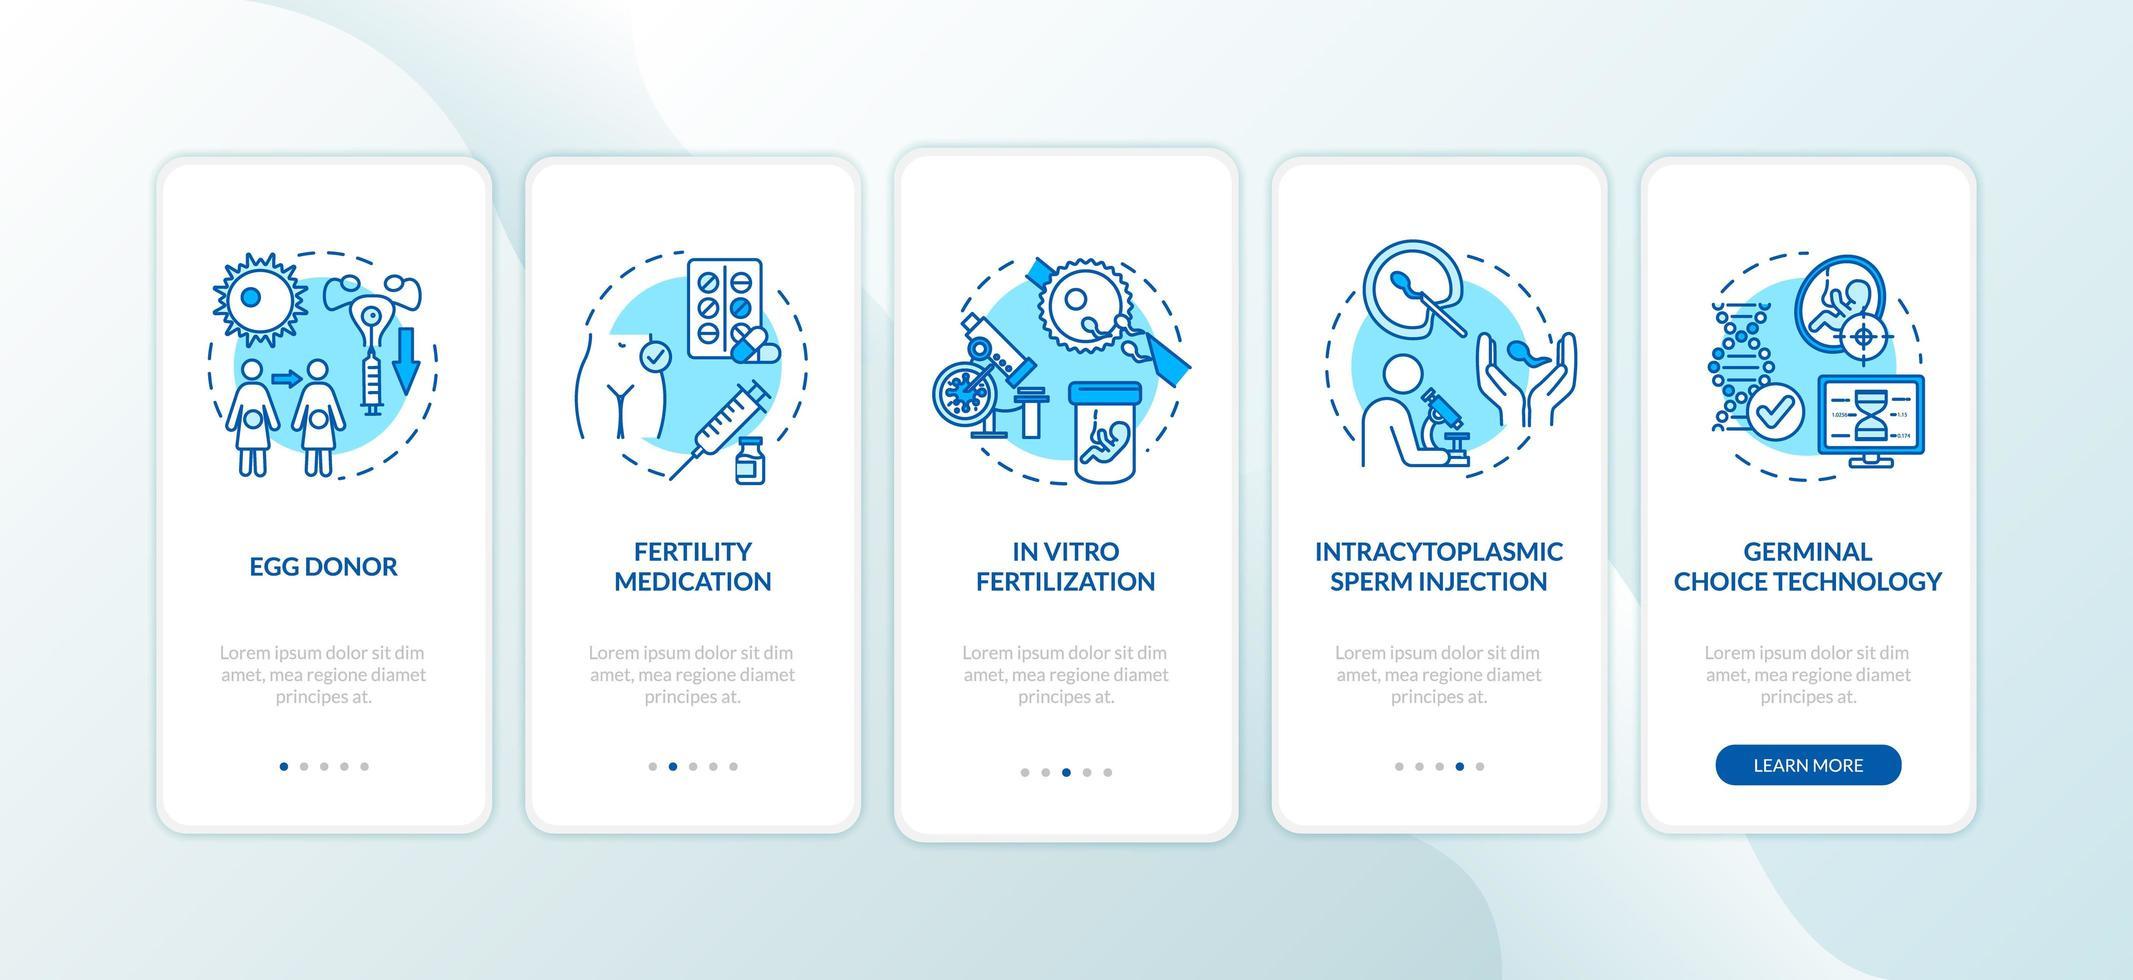 vruchtbaarheidsmedicatie onboarding mobiele app-pagina vector